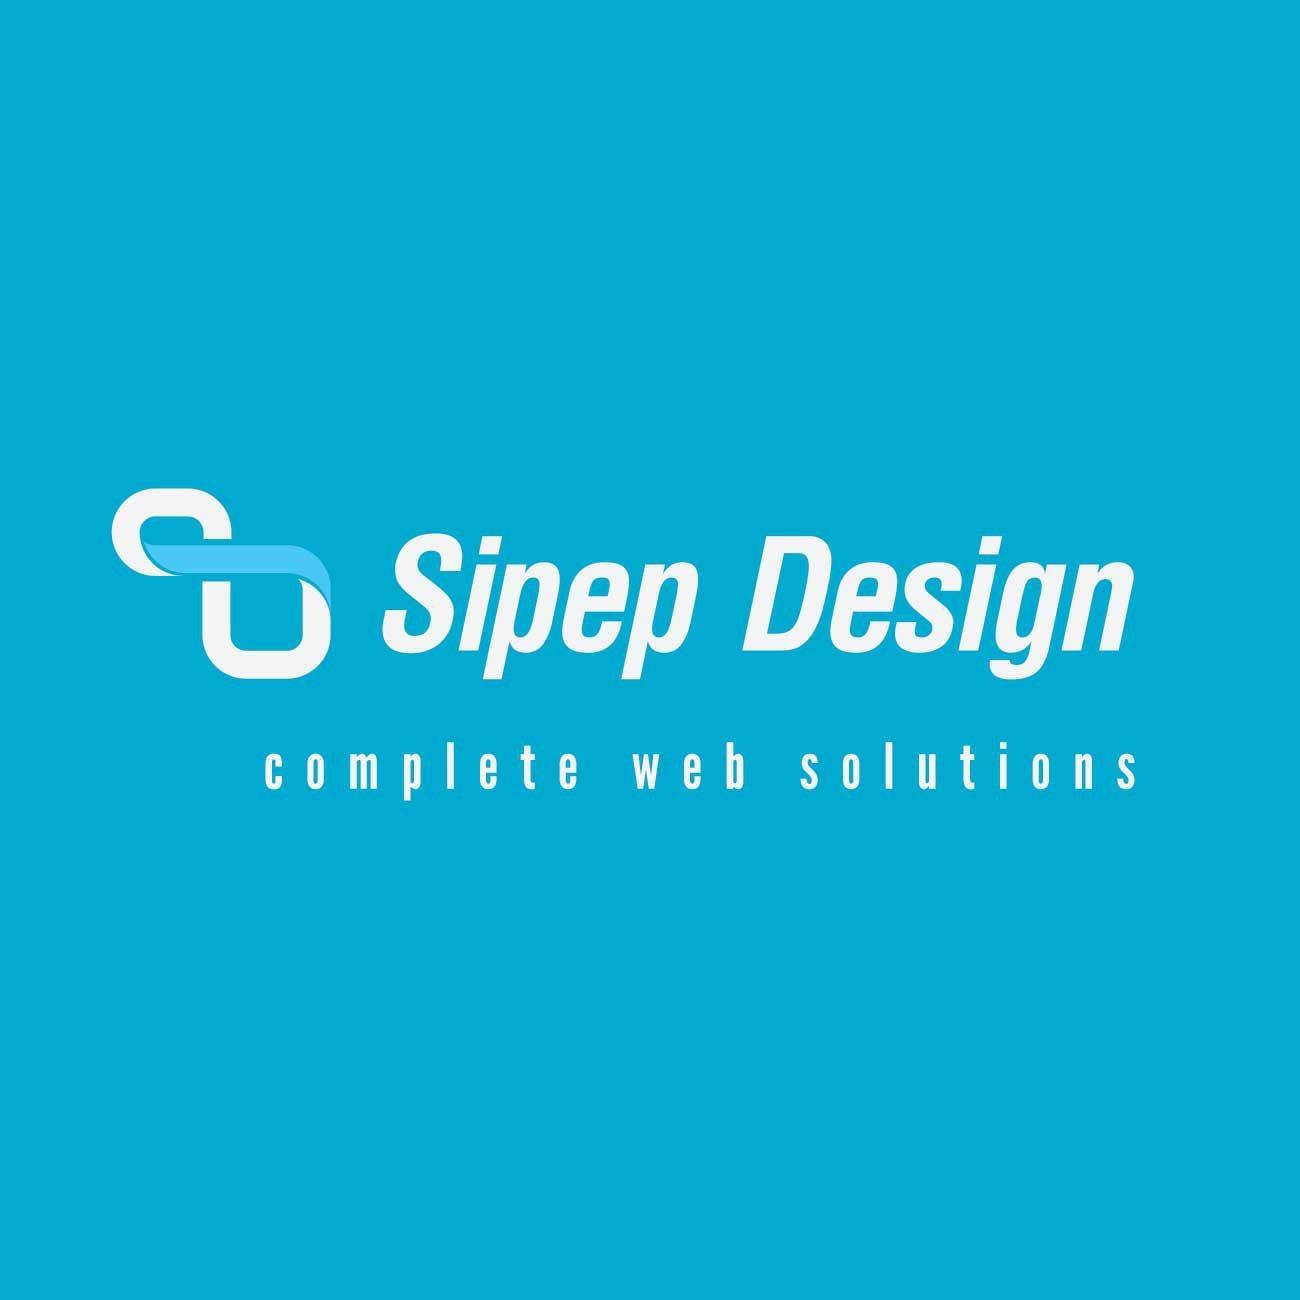 Sipep Design